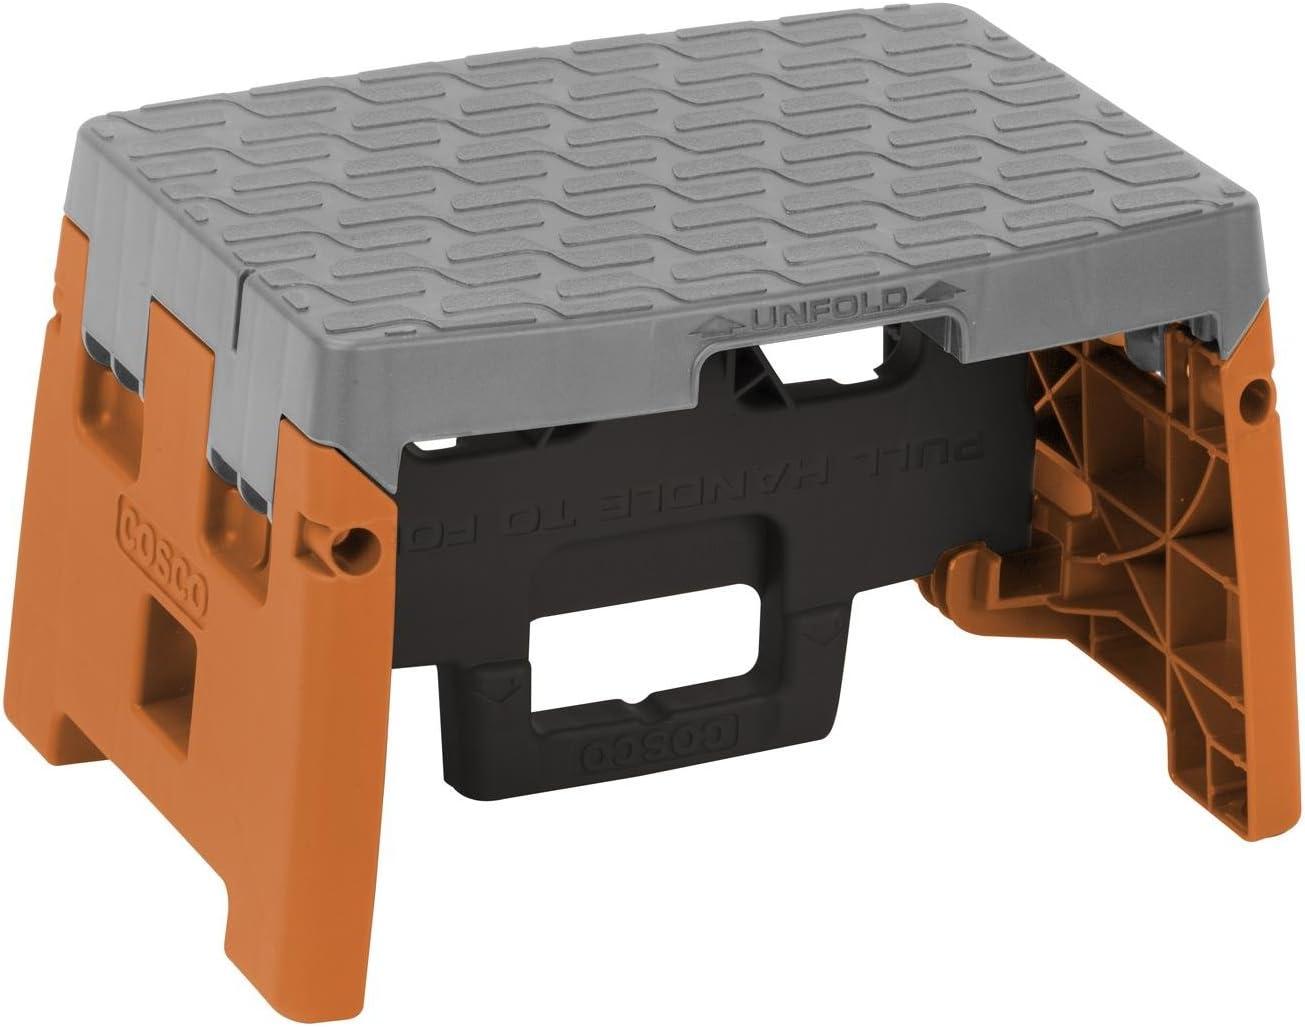 COSCO 1 Step Molded Folding Step Stool, Type 1A, Black, Orange, and Gray